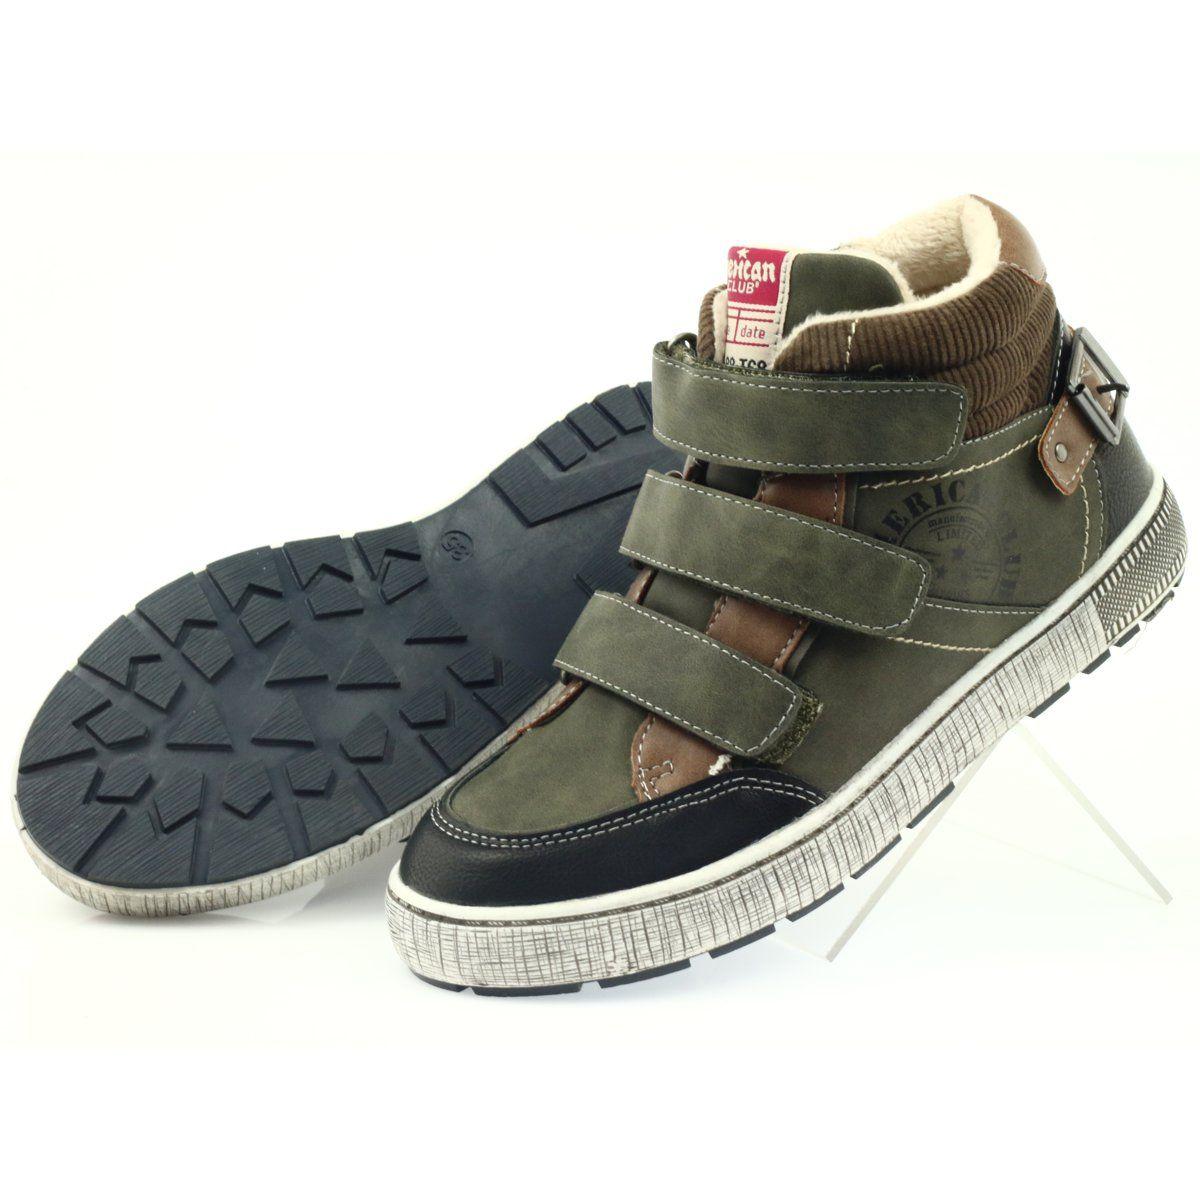 American Club Zielone Trzewiki Sportowe Zimowe 17779 Czarne Brazowe Winter Sport Shoes Winter Shoes Sports Shoes